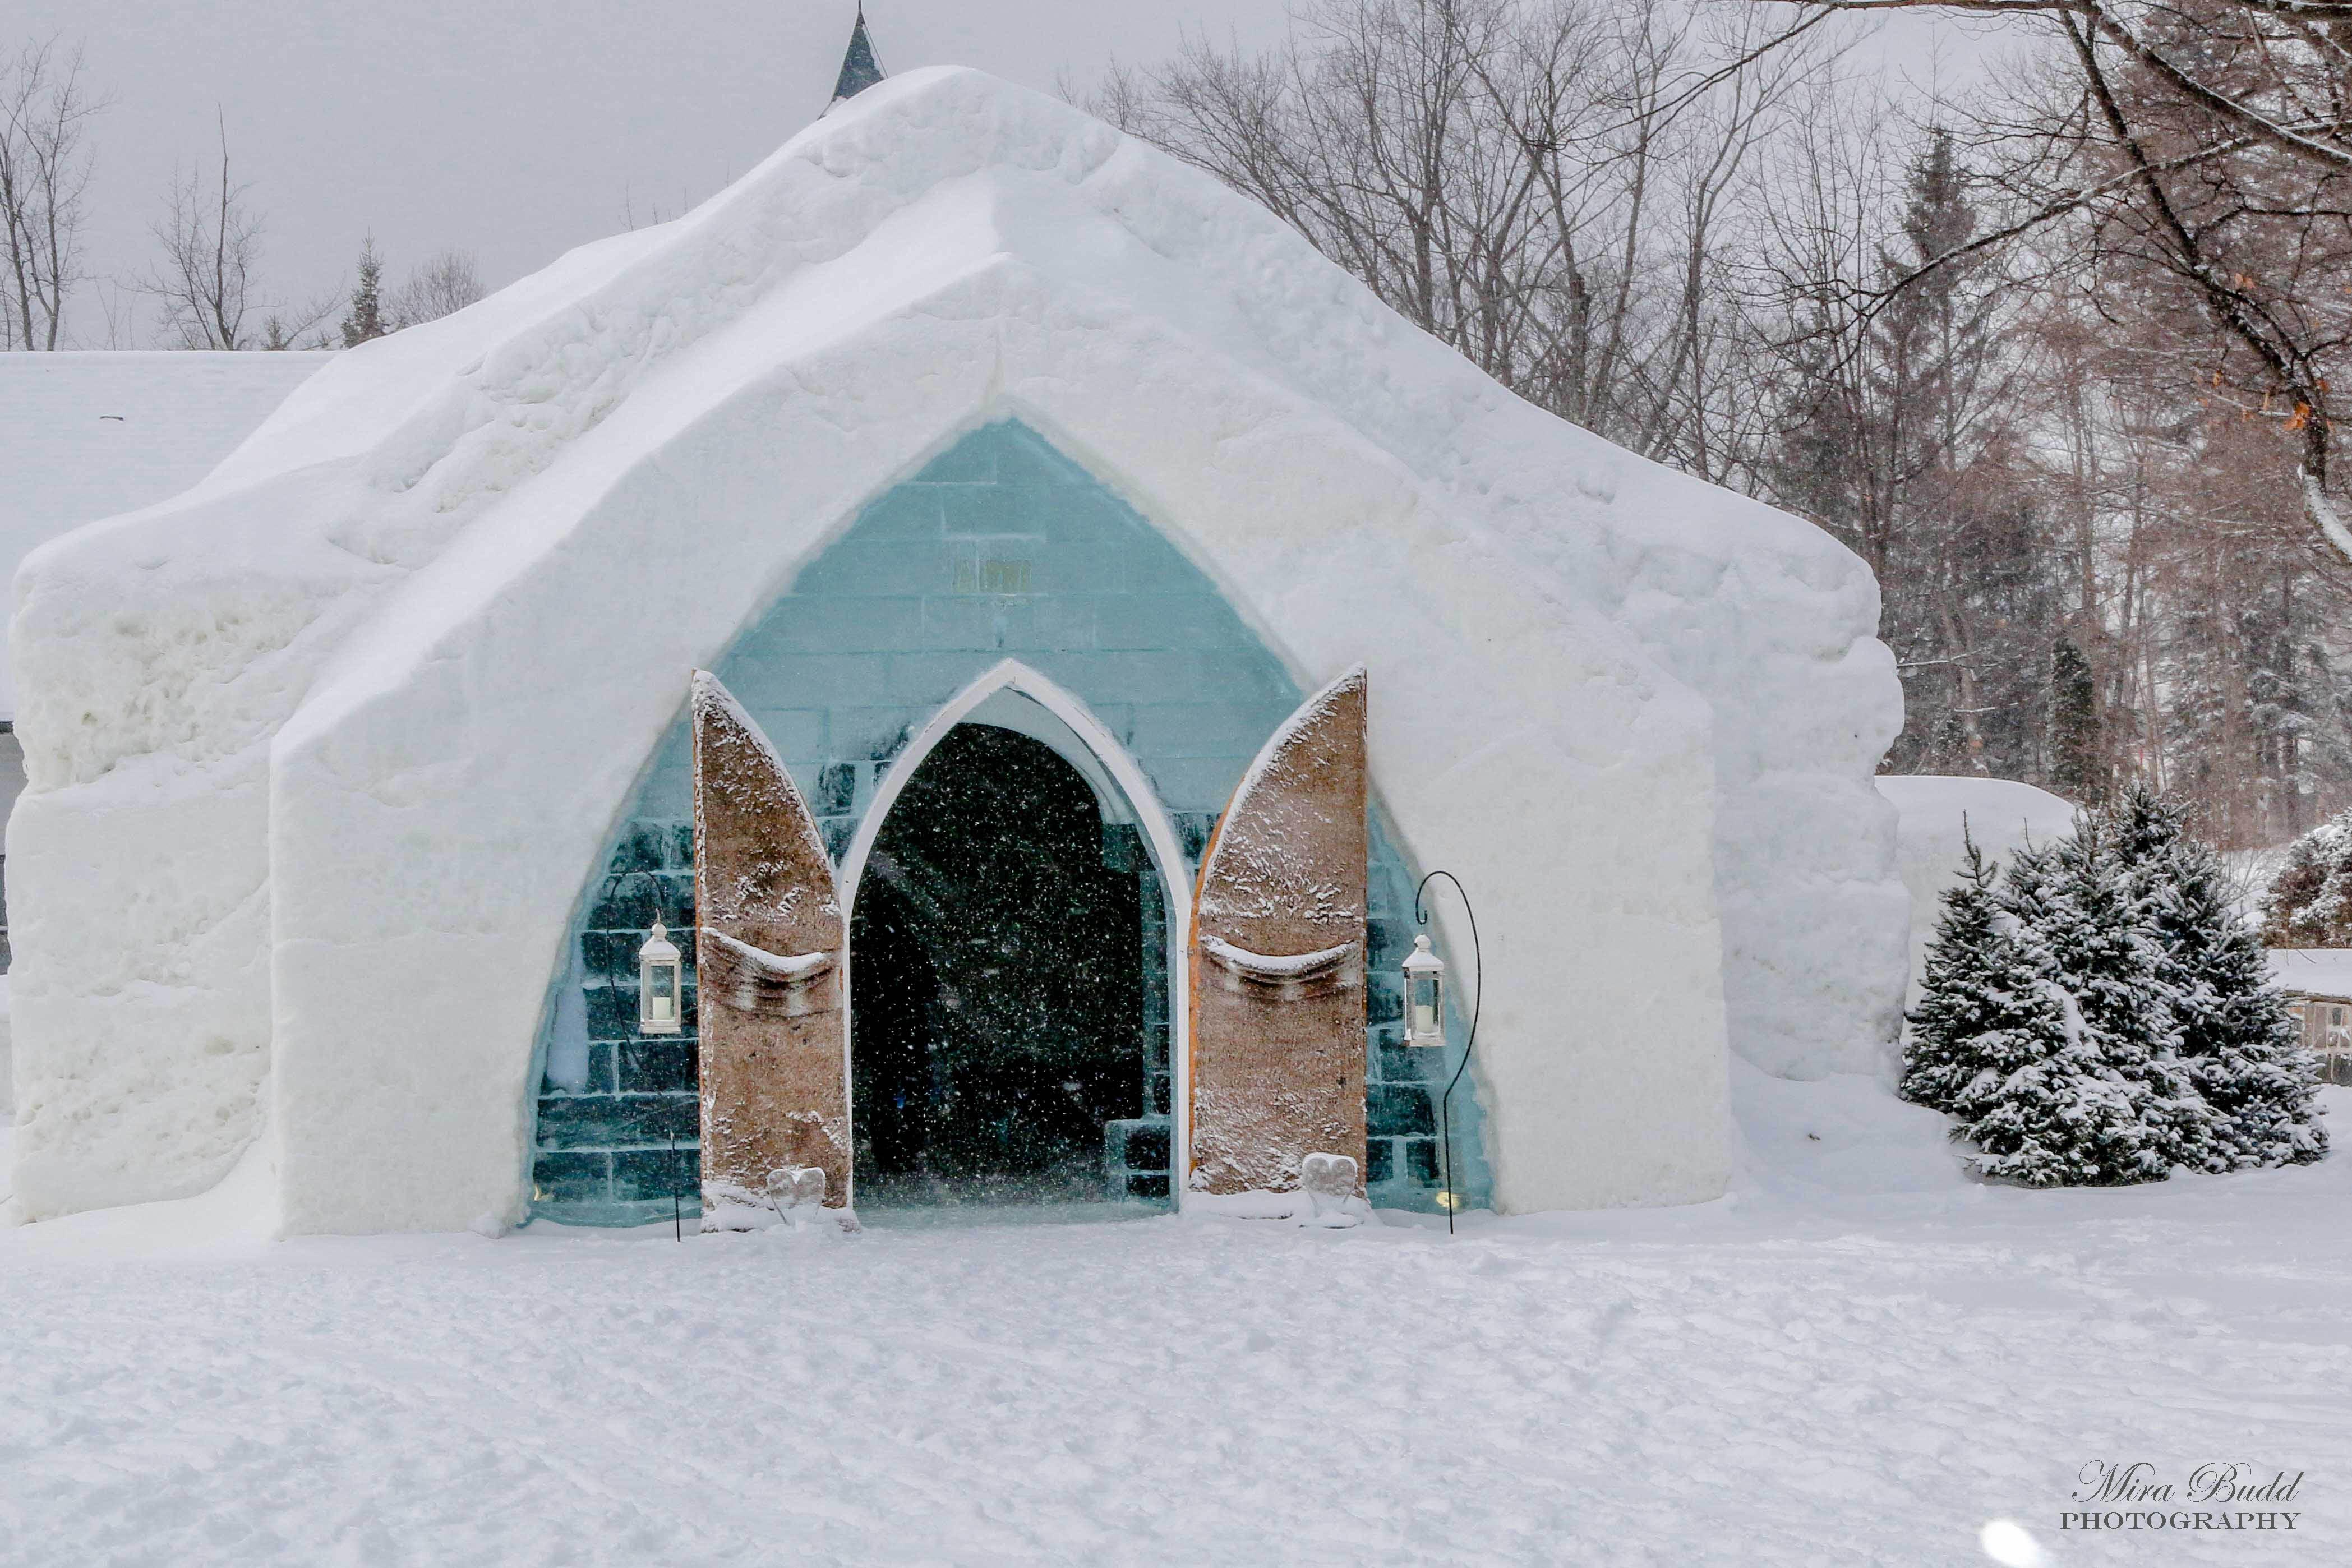 H Tel De Glace De Quebec Ice Hotel Quebec City Lifeology 101